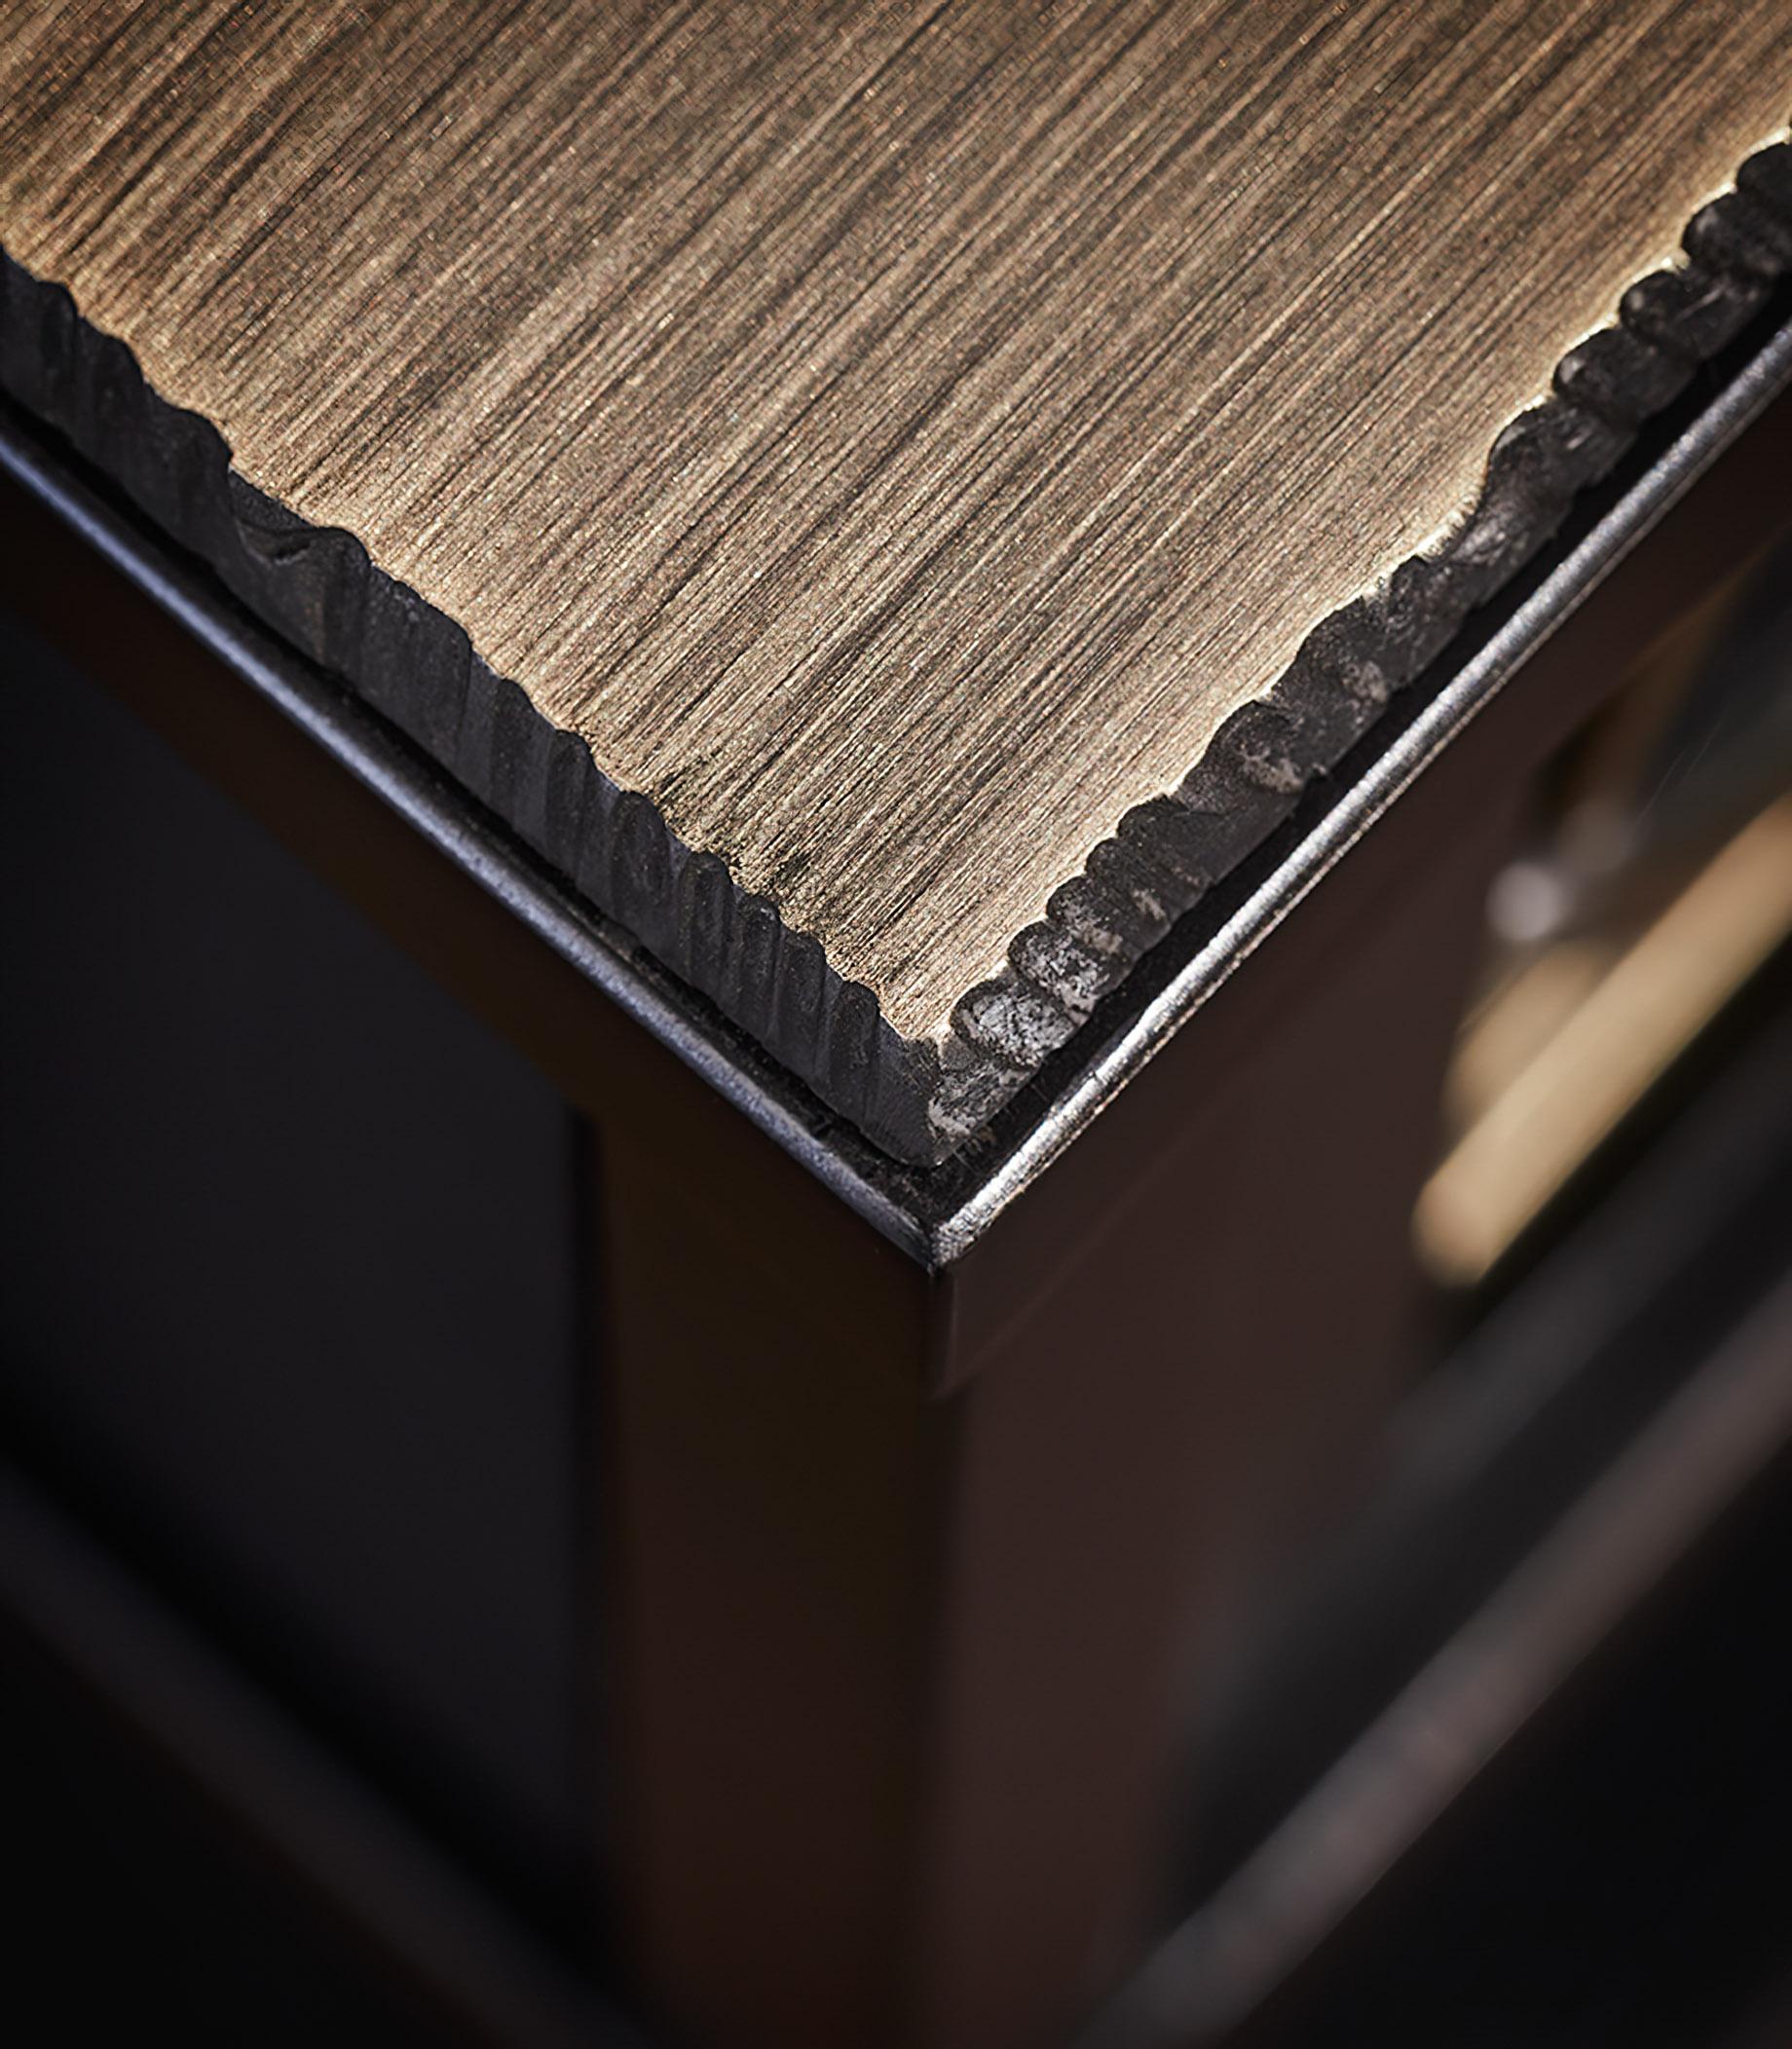 RONDELLE Craftmark Luxury Furniture Collection – John Pomp – Rondelle Side Table